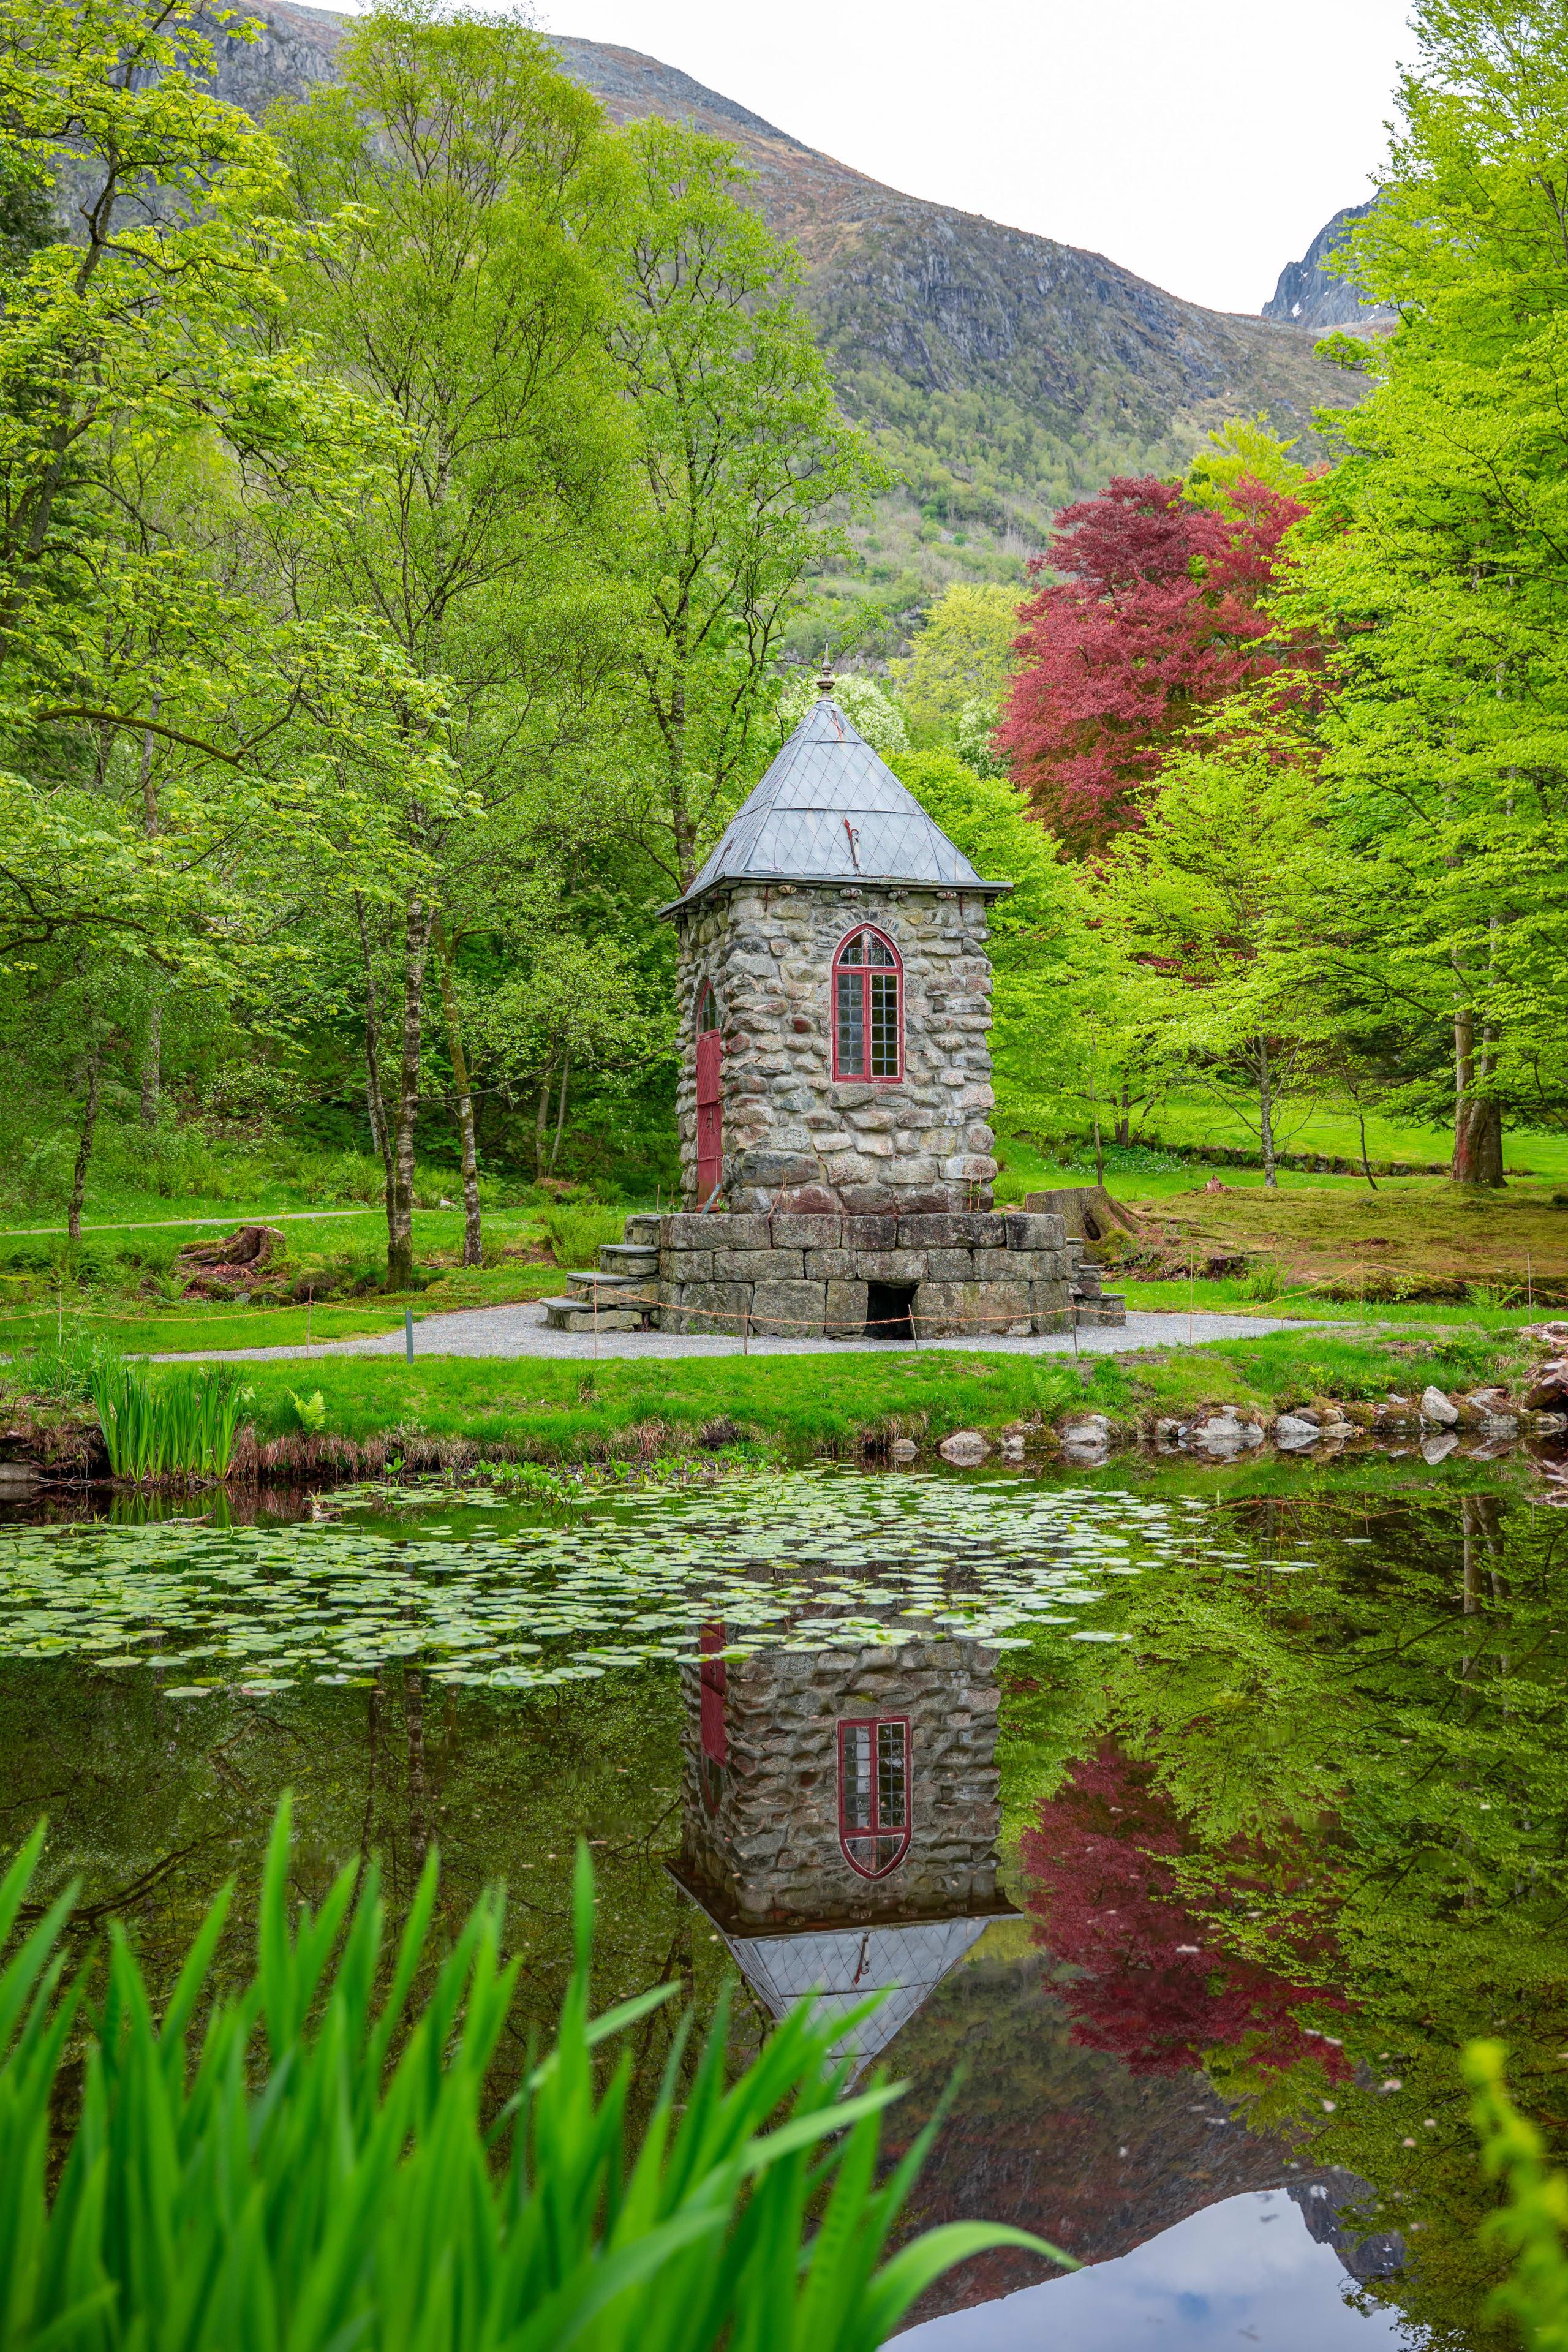 Pond area in the Barony gardens in Rosendal